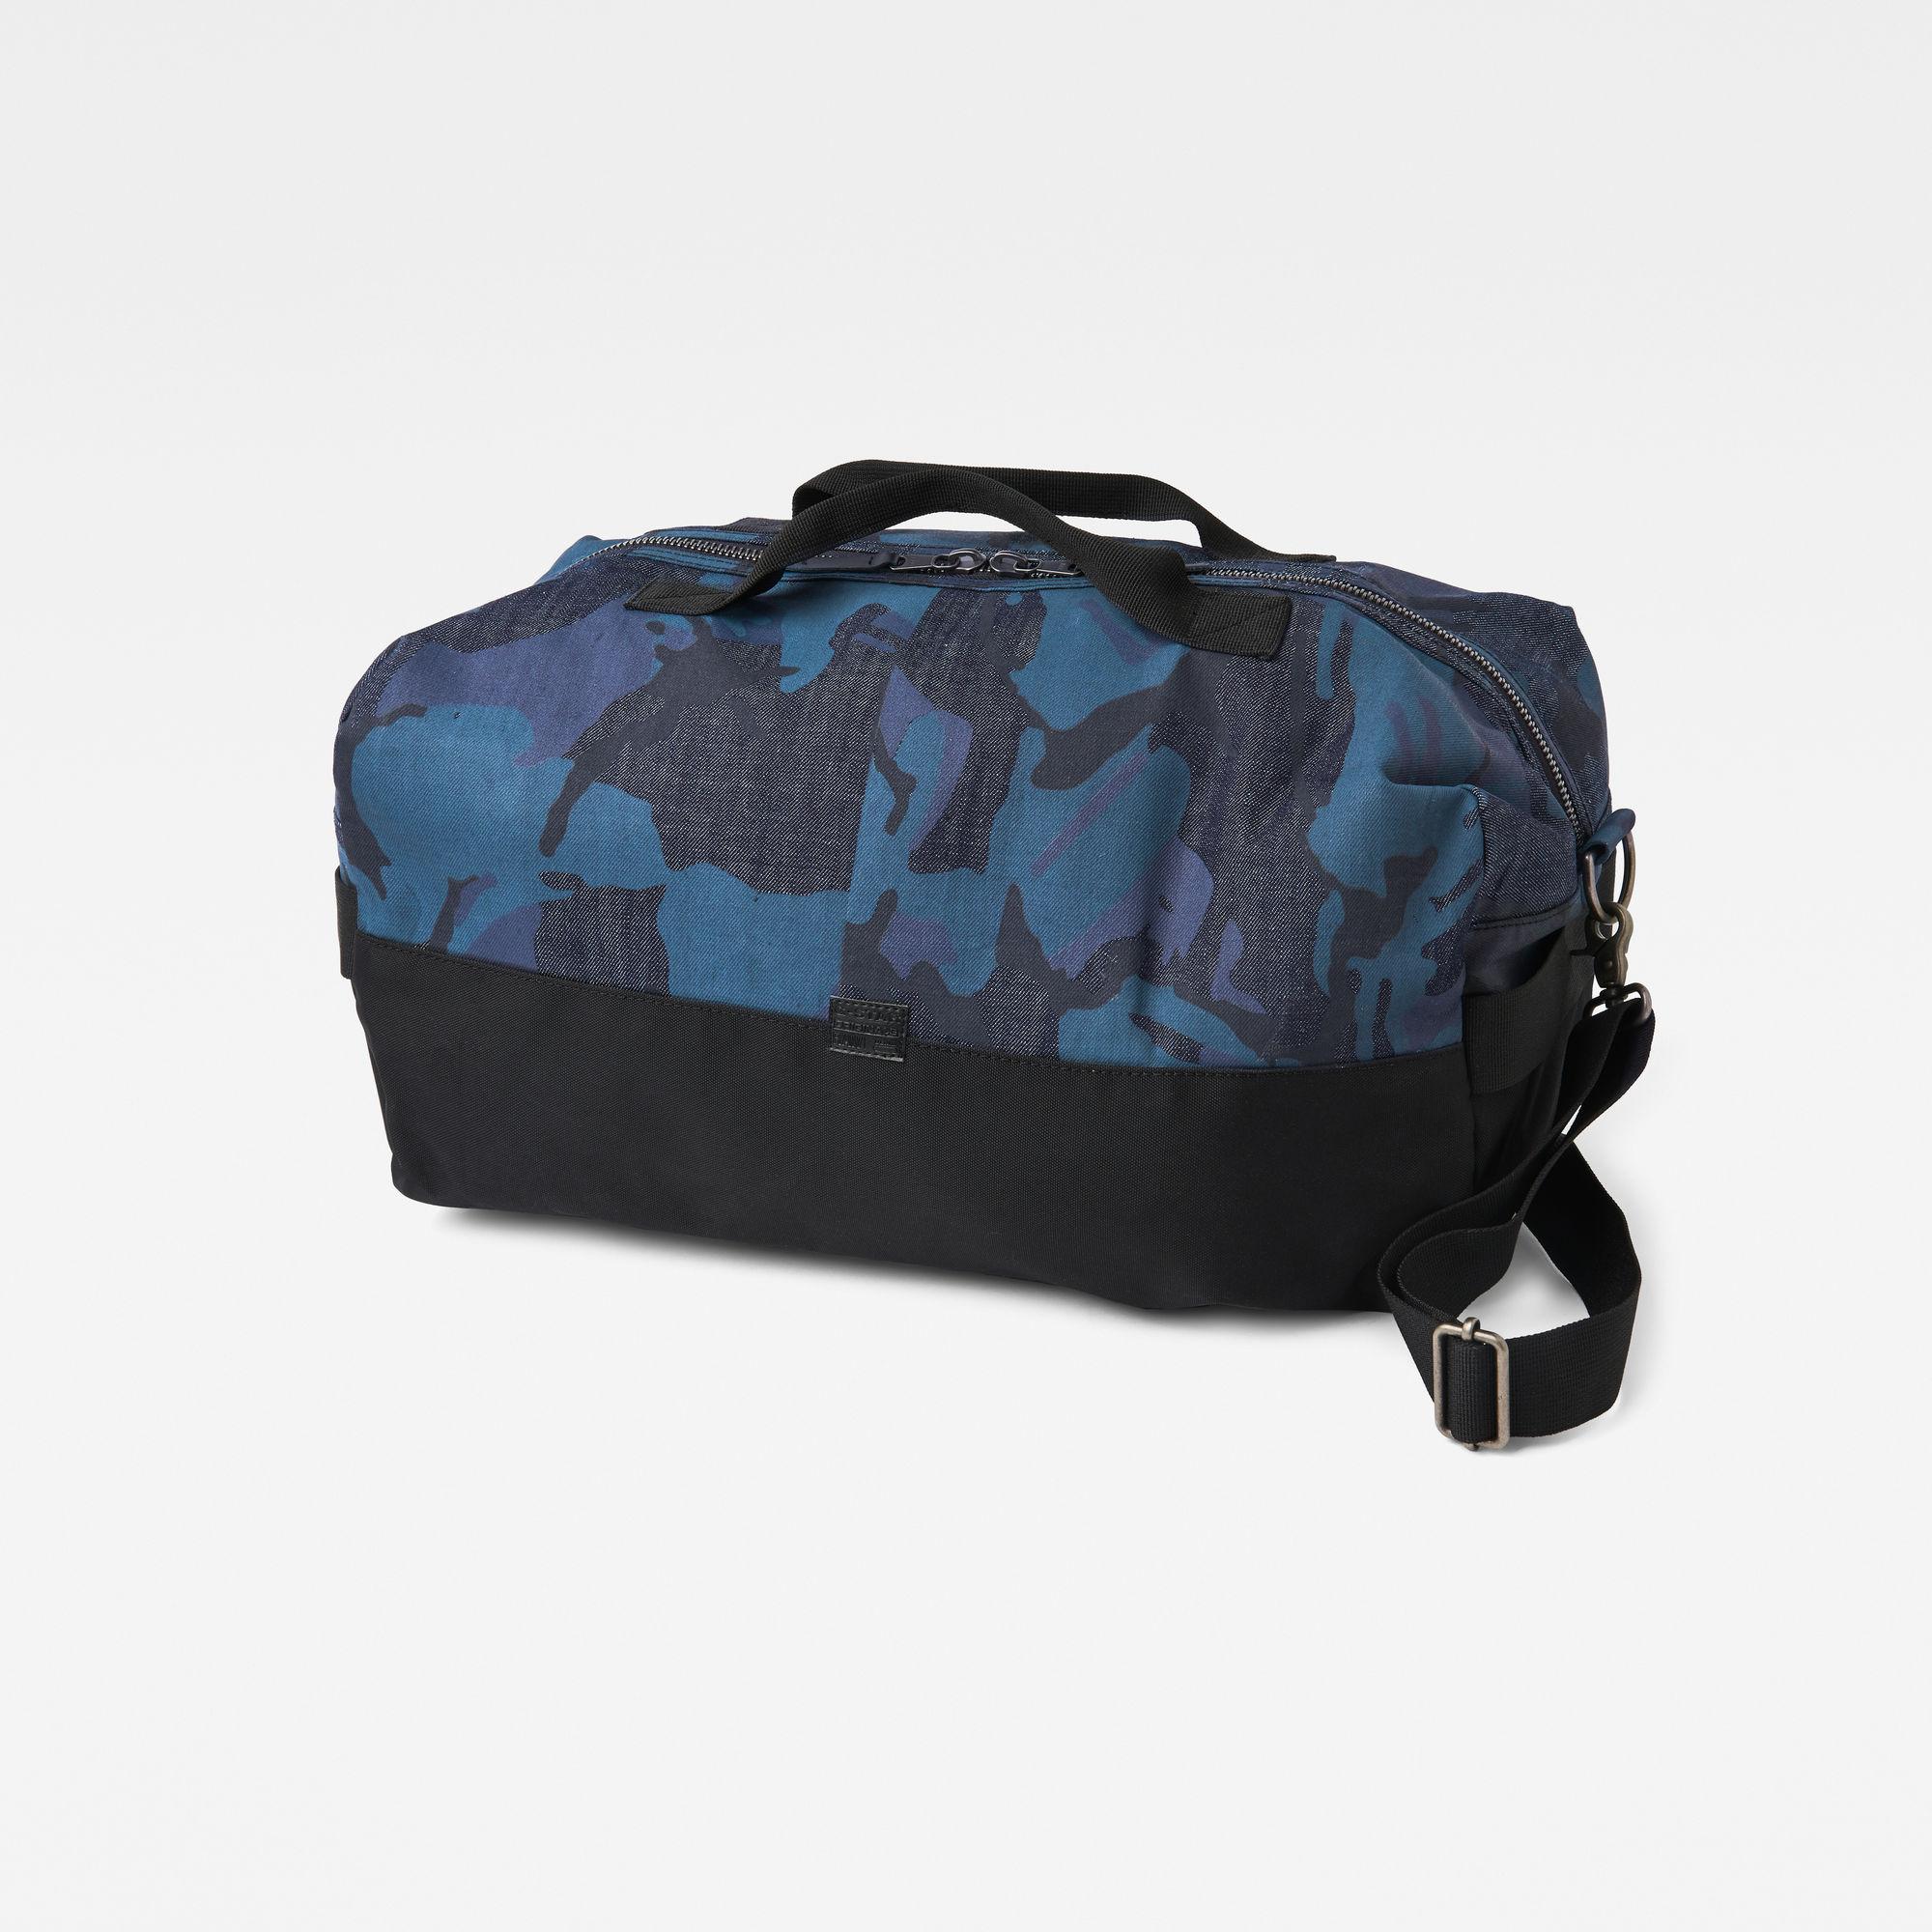 Image of G Star Raw Barran Duffle Bag Big